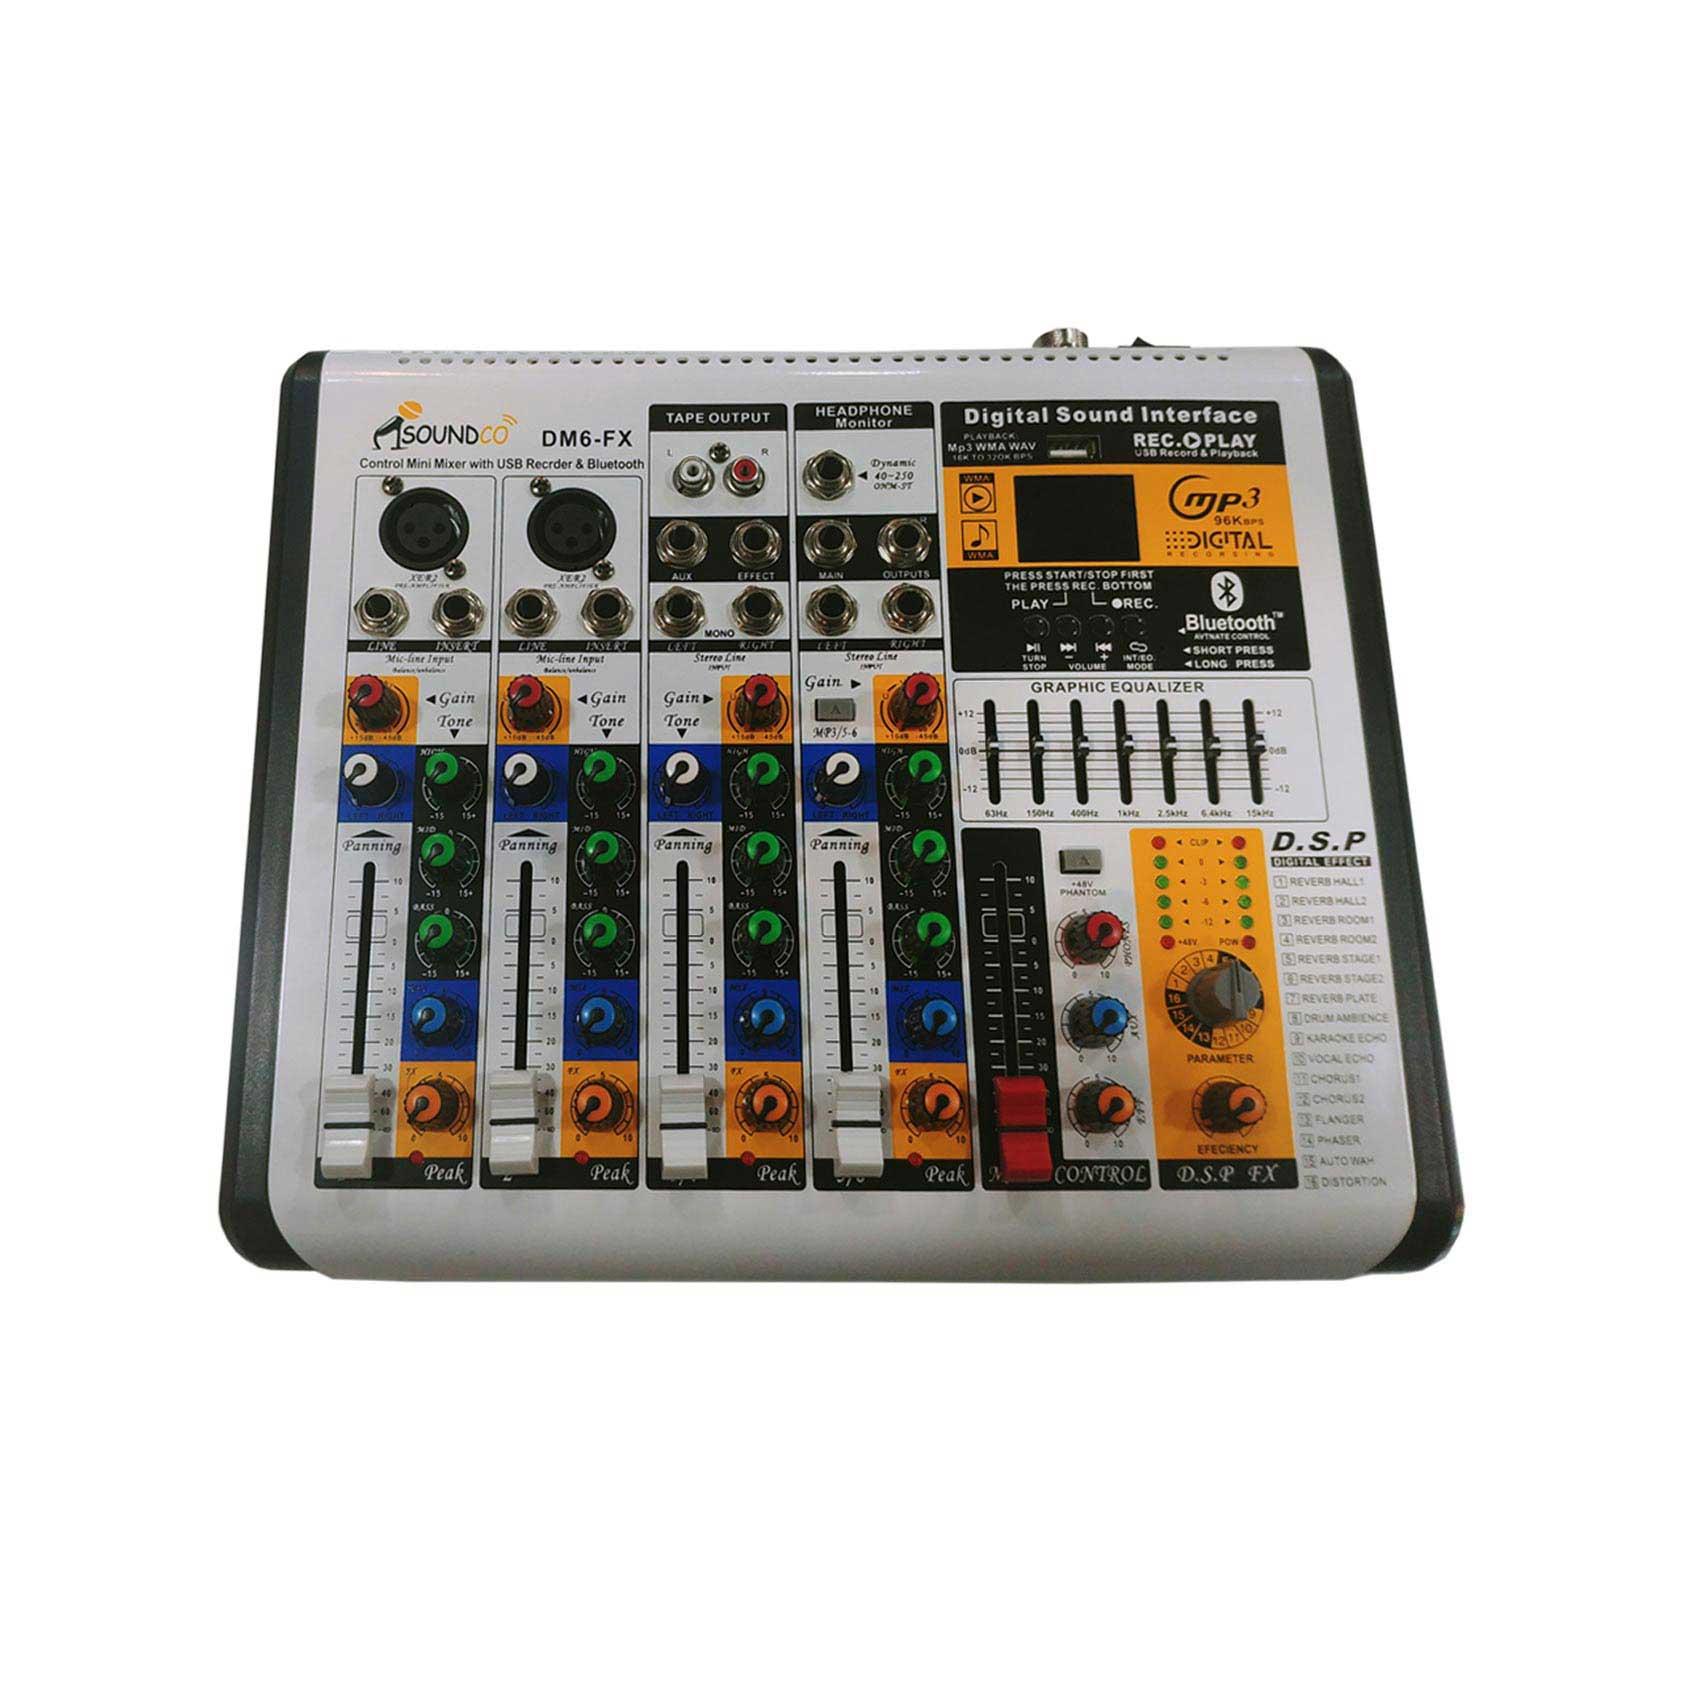 DM6-FX Audio Mixer